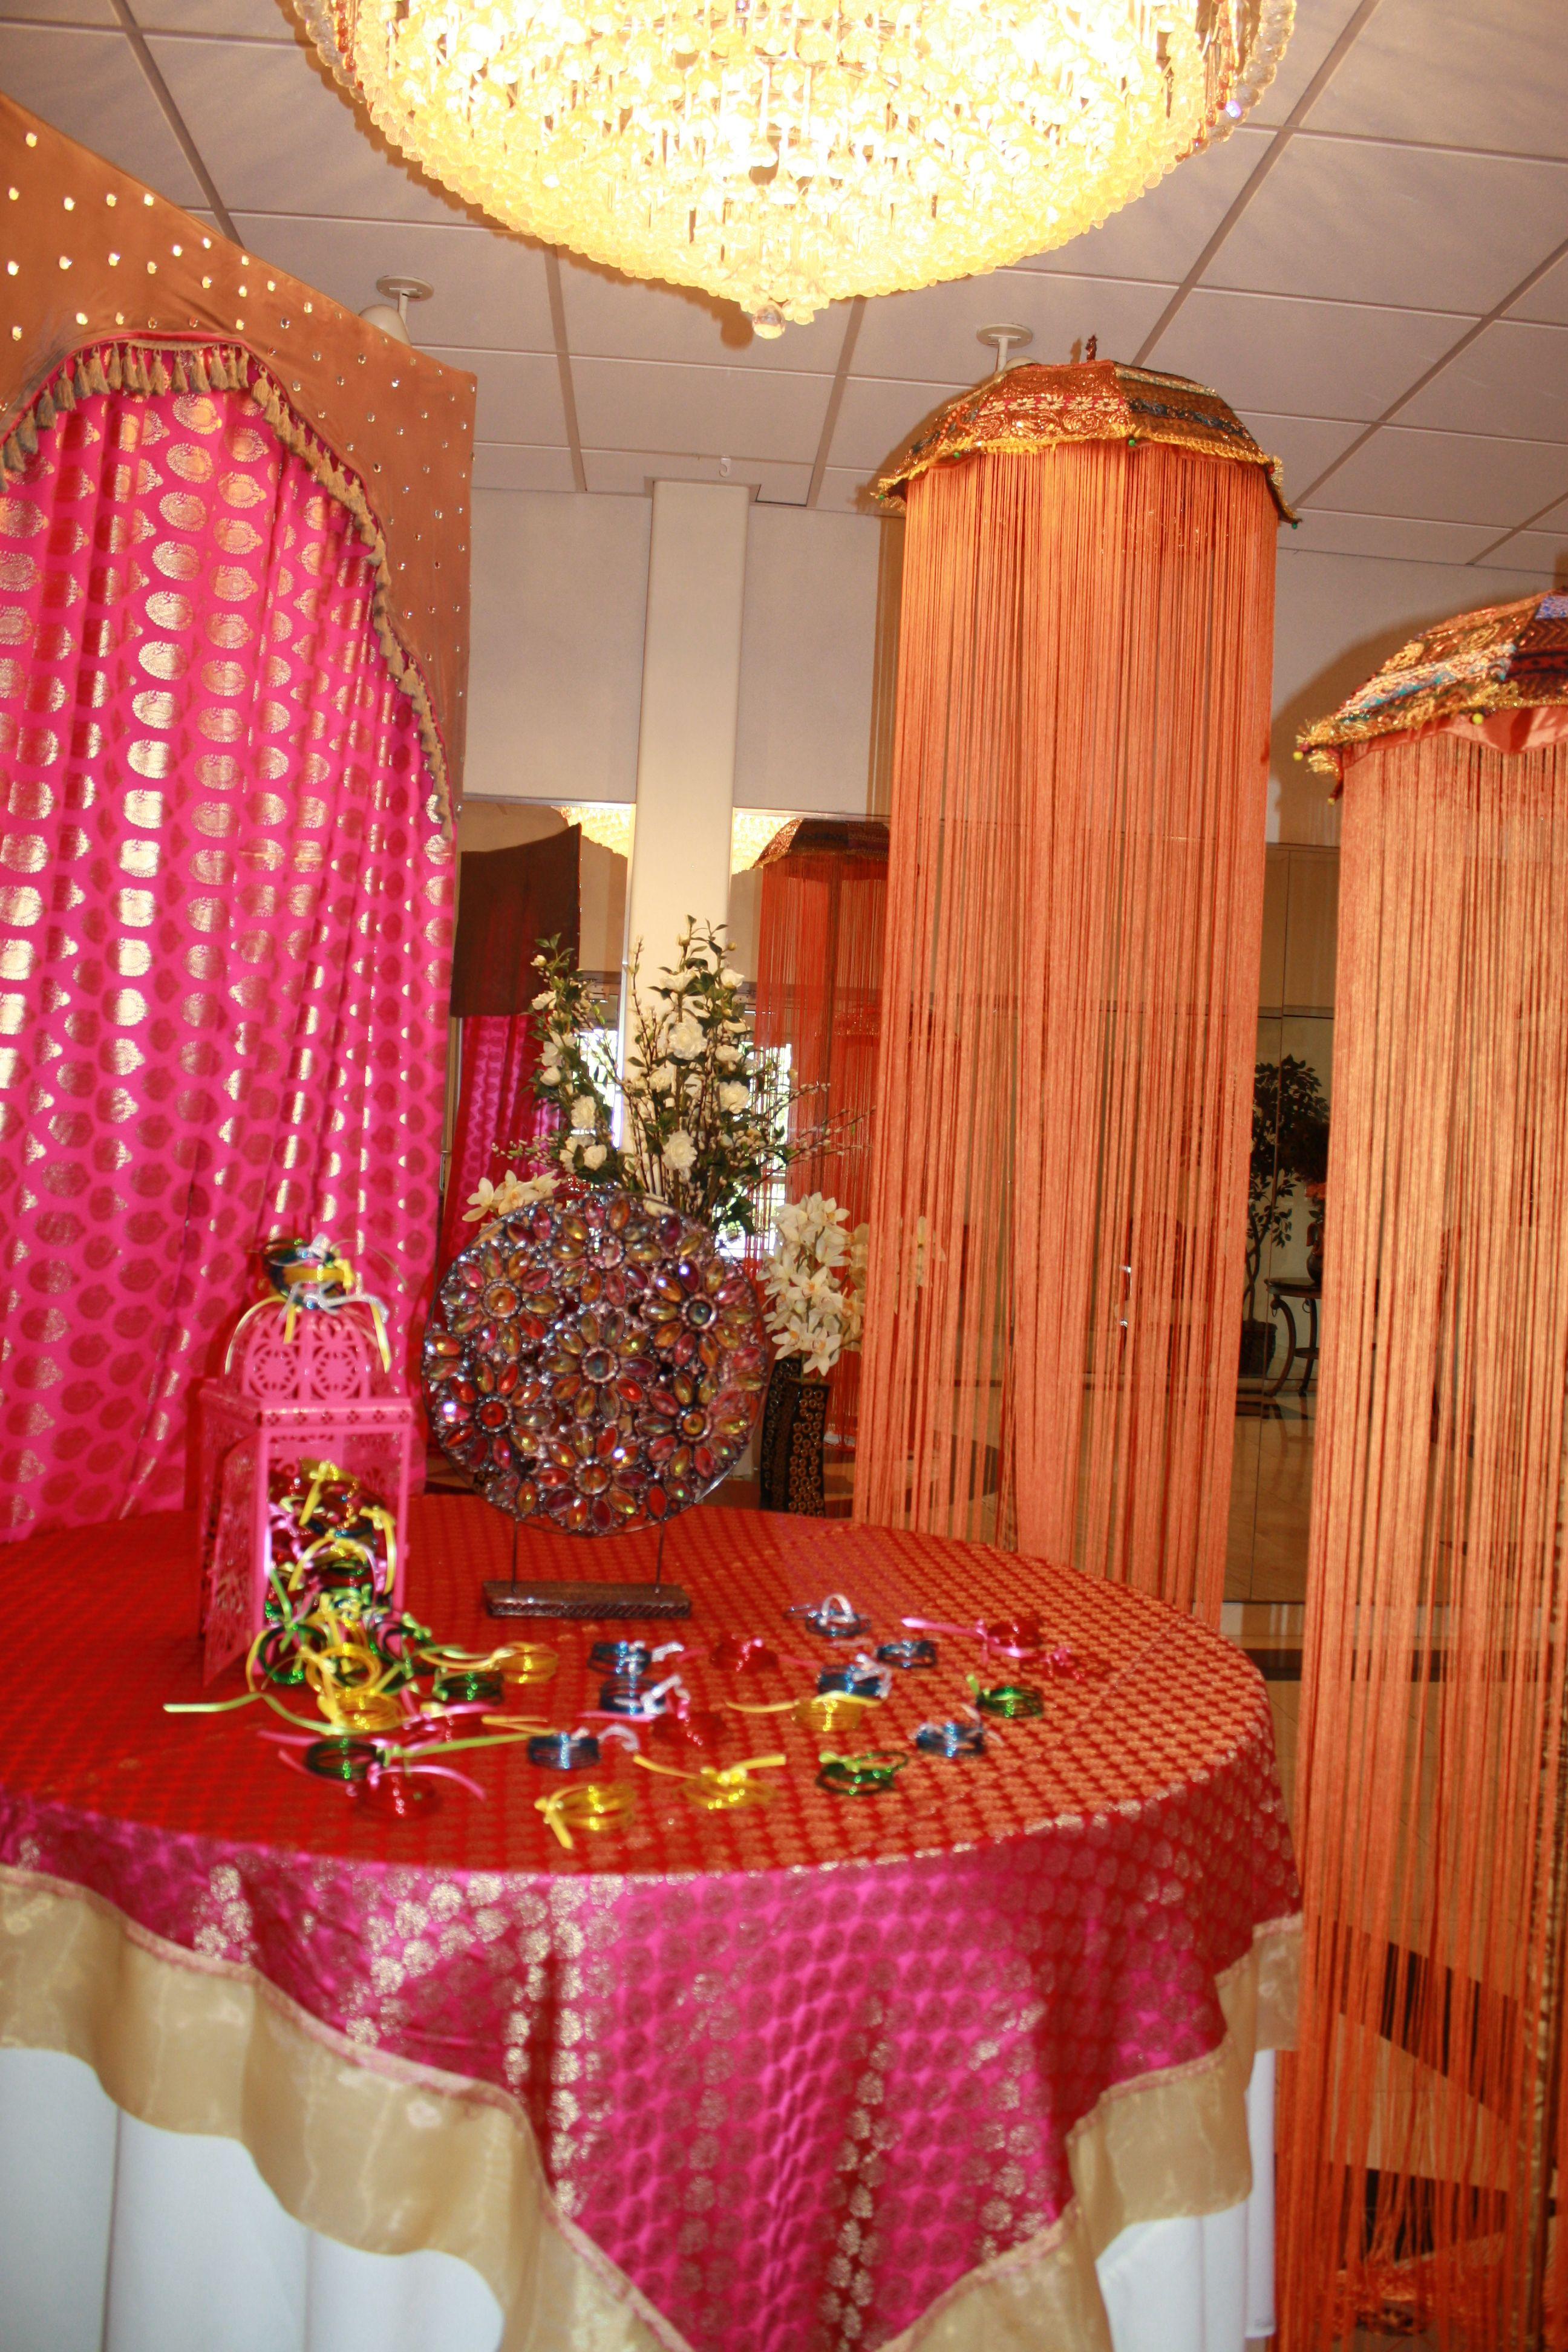 Mehndi Entrance For Bride : Mehndi party entrance welcome table meri shaadi aka